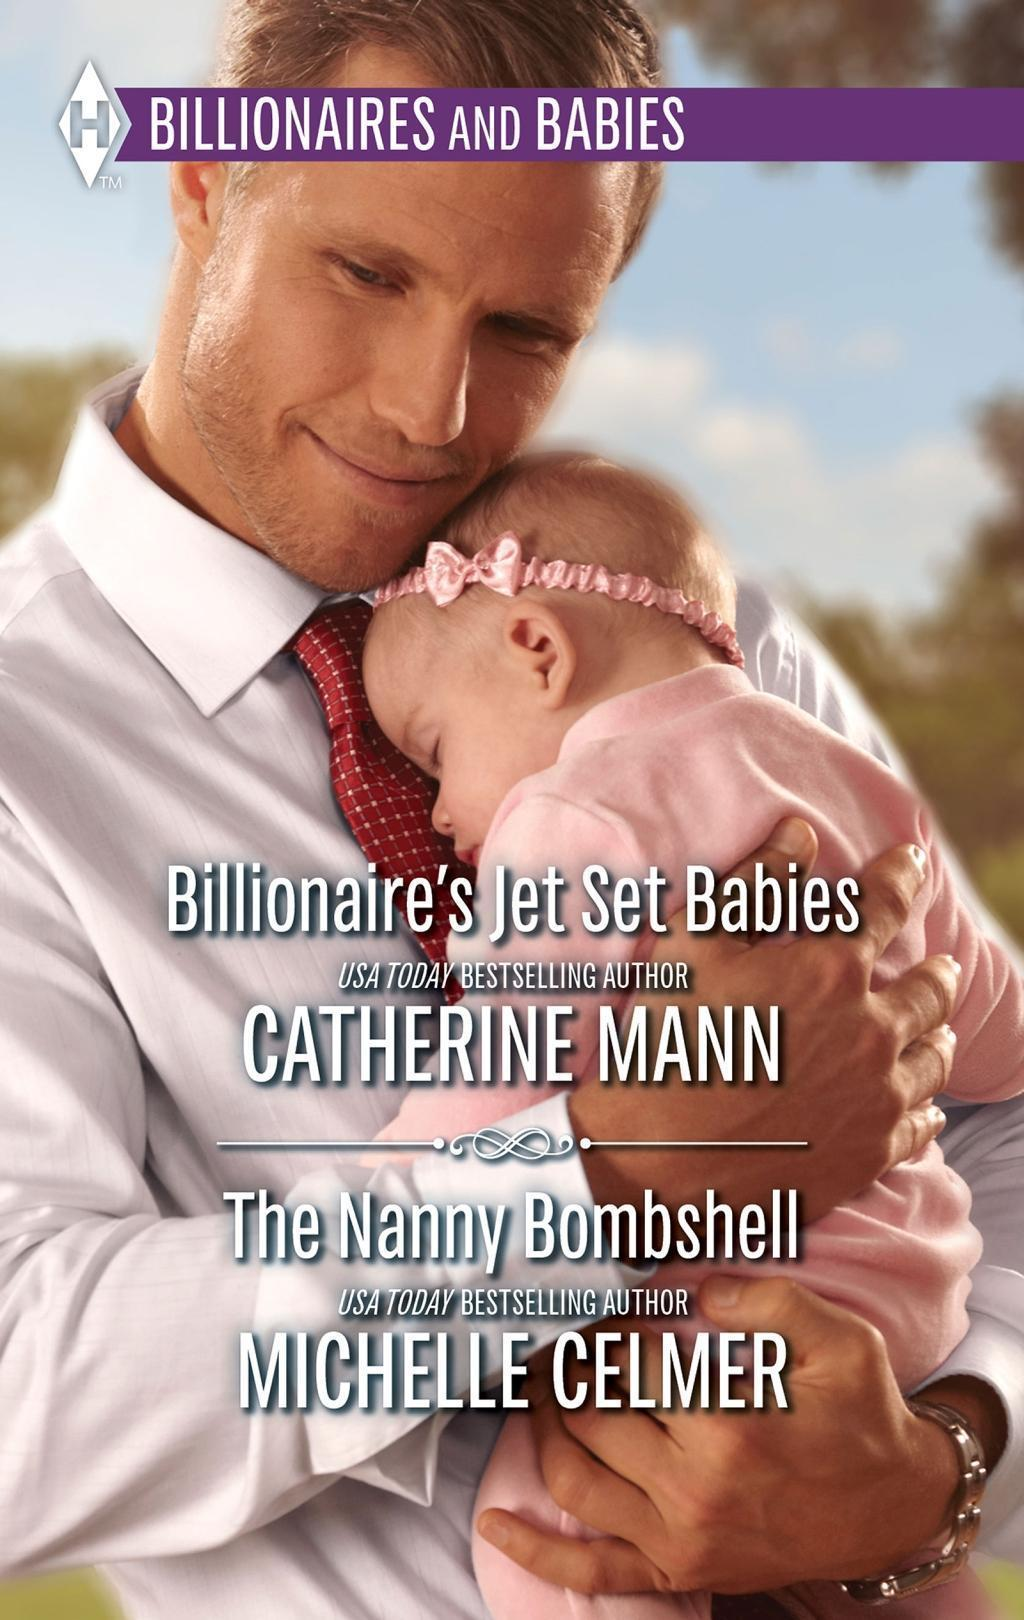 Billionaire's Jet Set Babies & The Nanny Bombshell: Billionaire's Jet Set Babies / The Nanny Bombshell (Mills & Boon M&B)